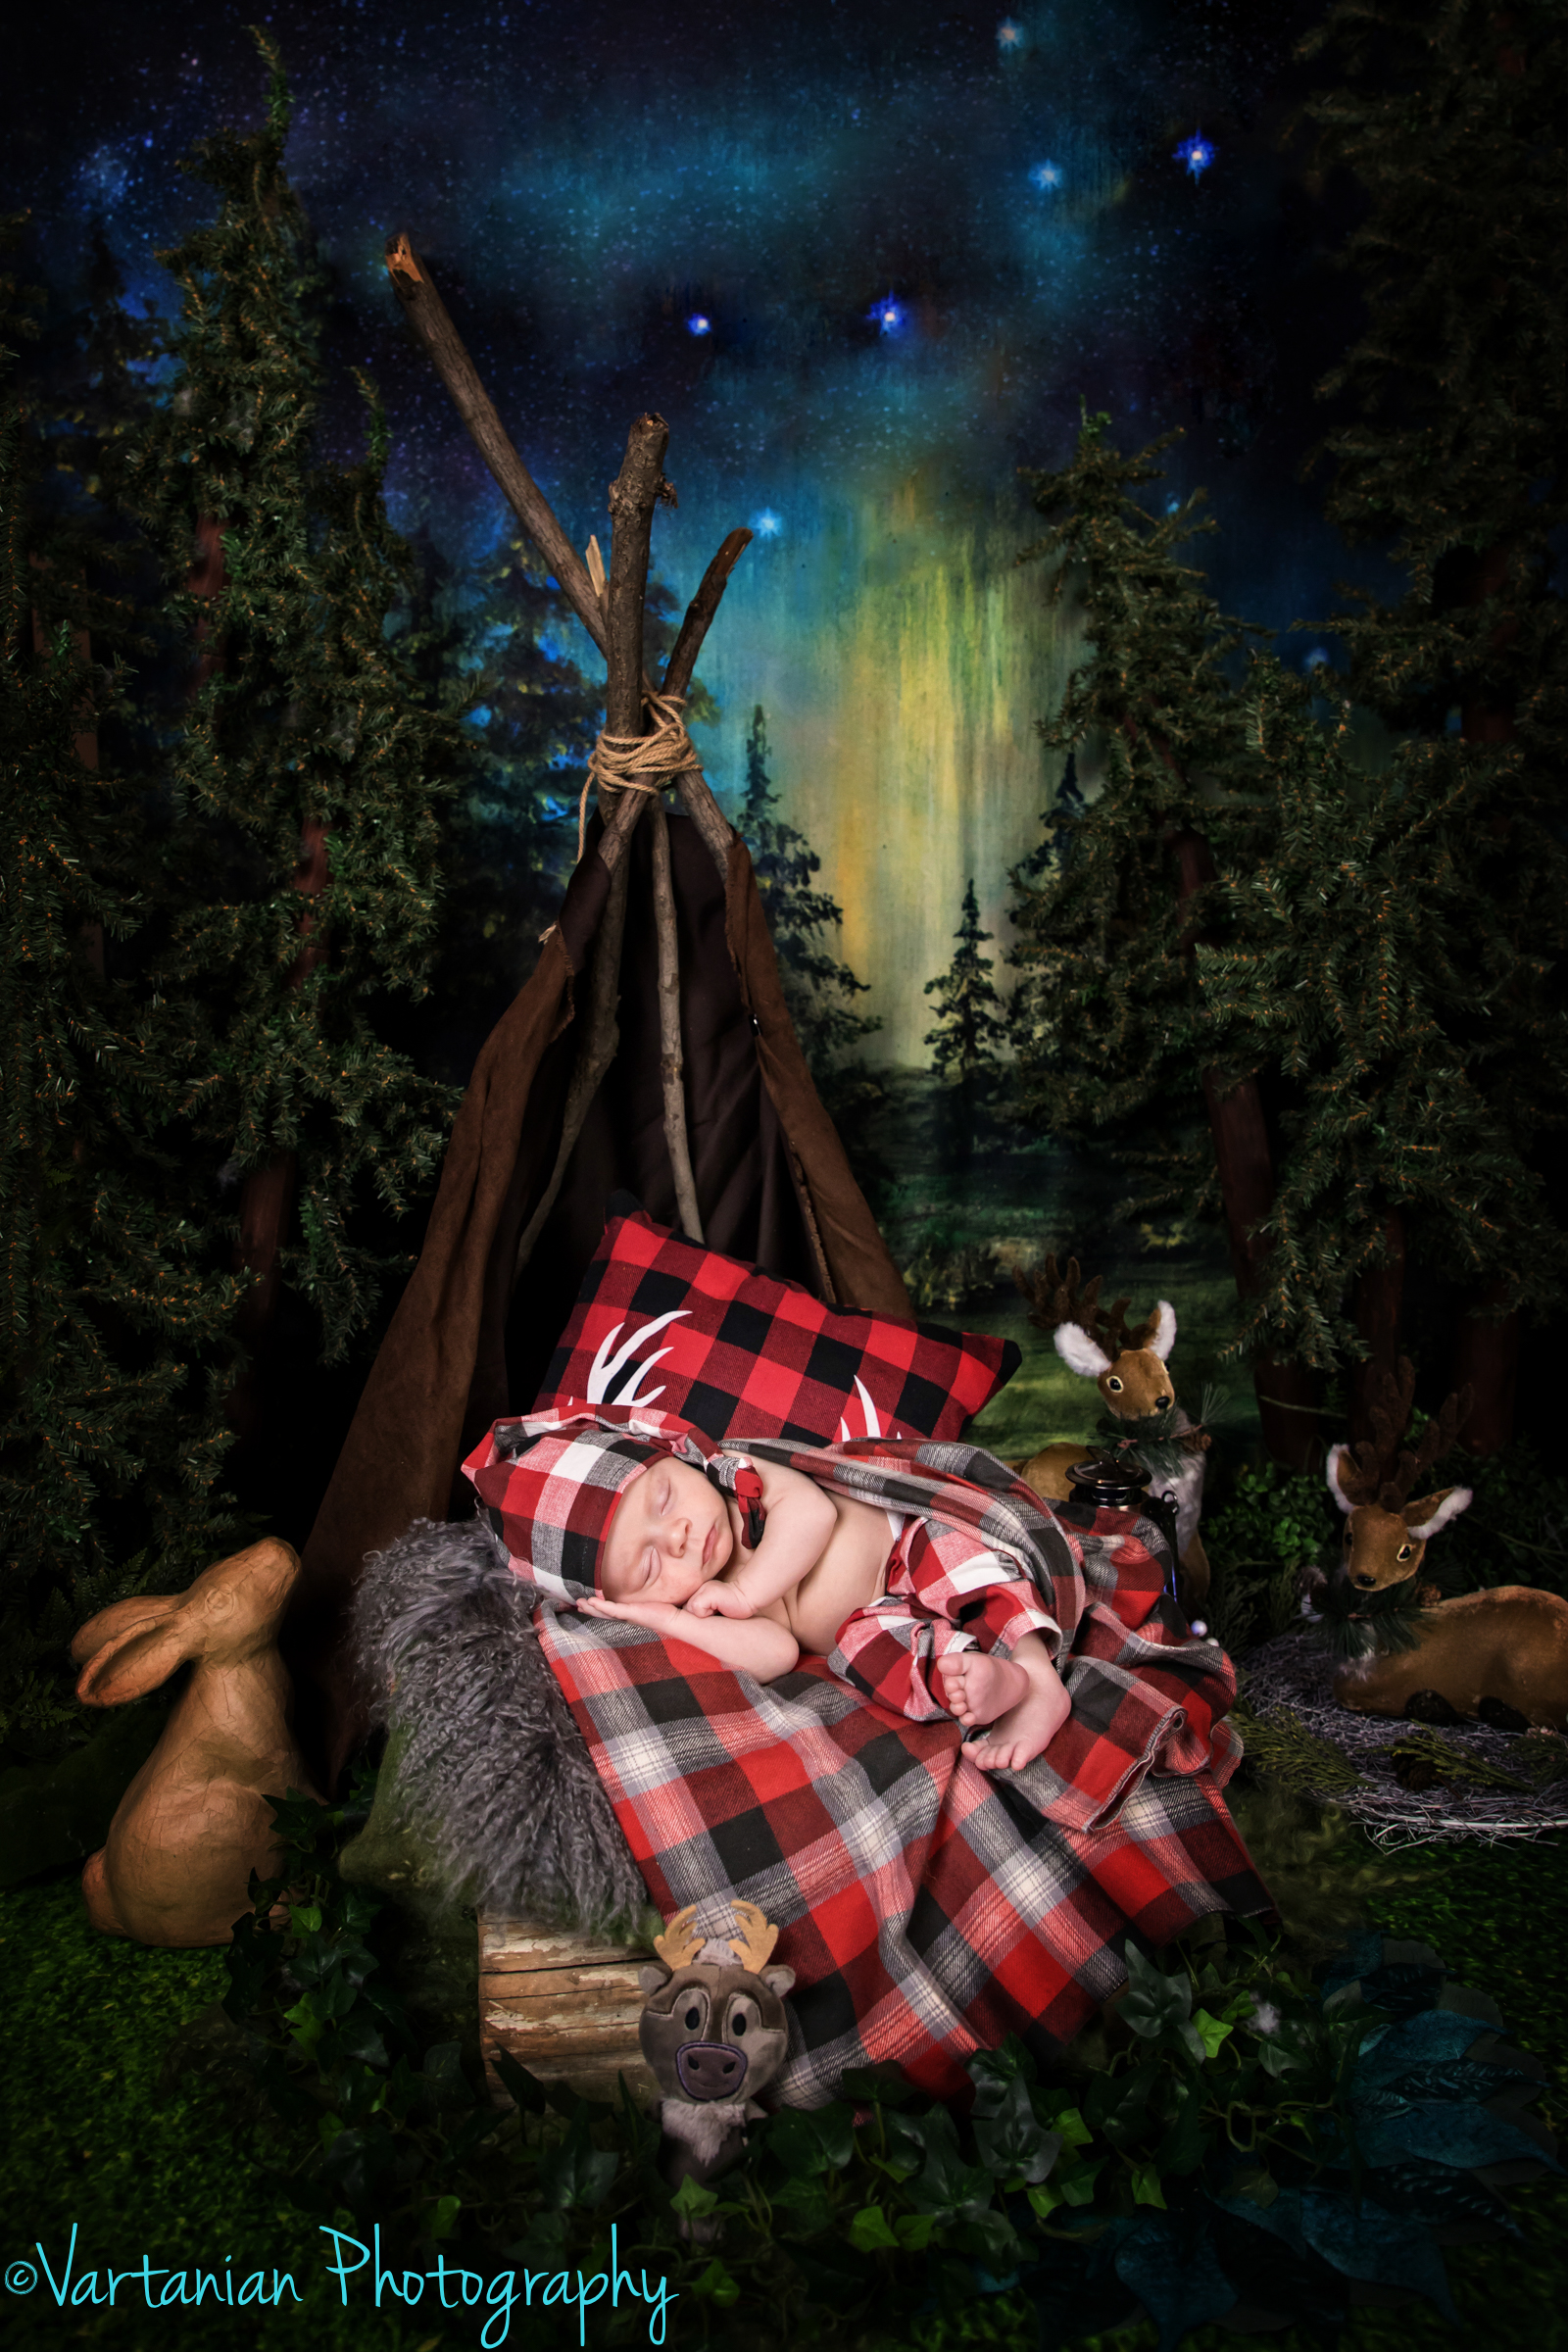 Newborn-Livonia-Vartanian-Photography-Plymouth-michigan-Mary-Vartanian-6.jpg